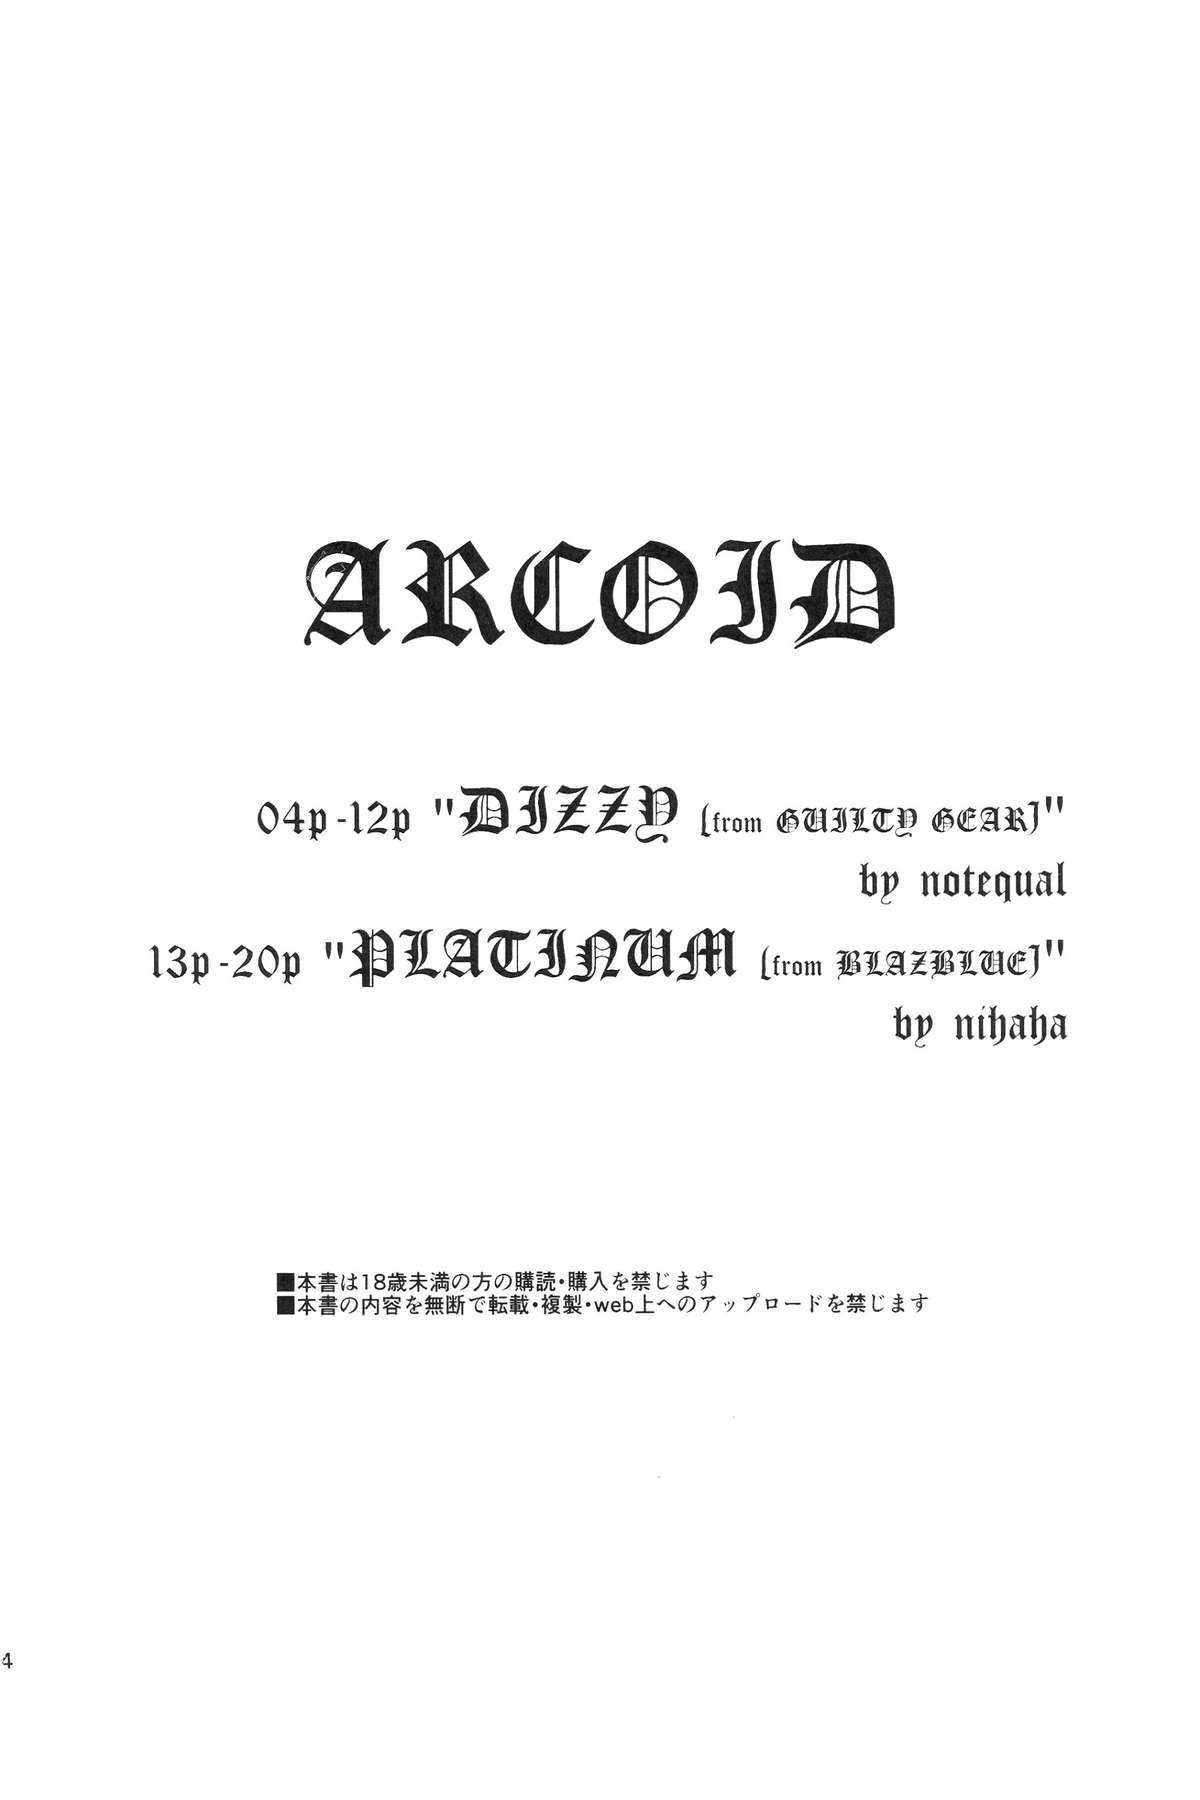 ARCOID 3